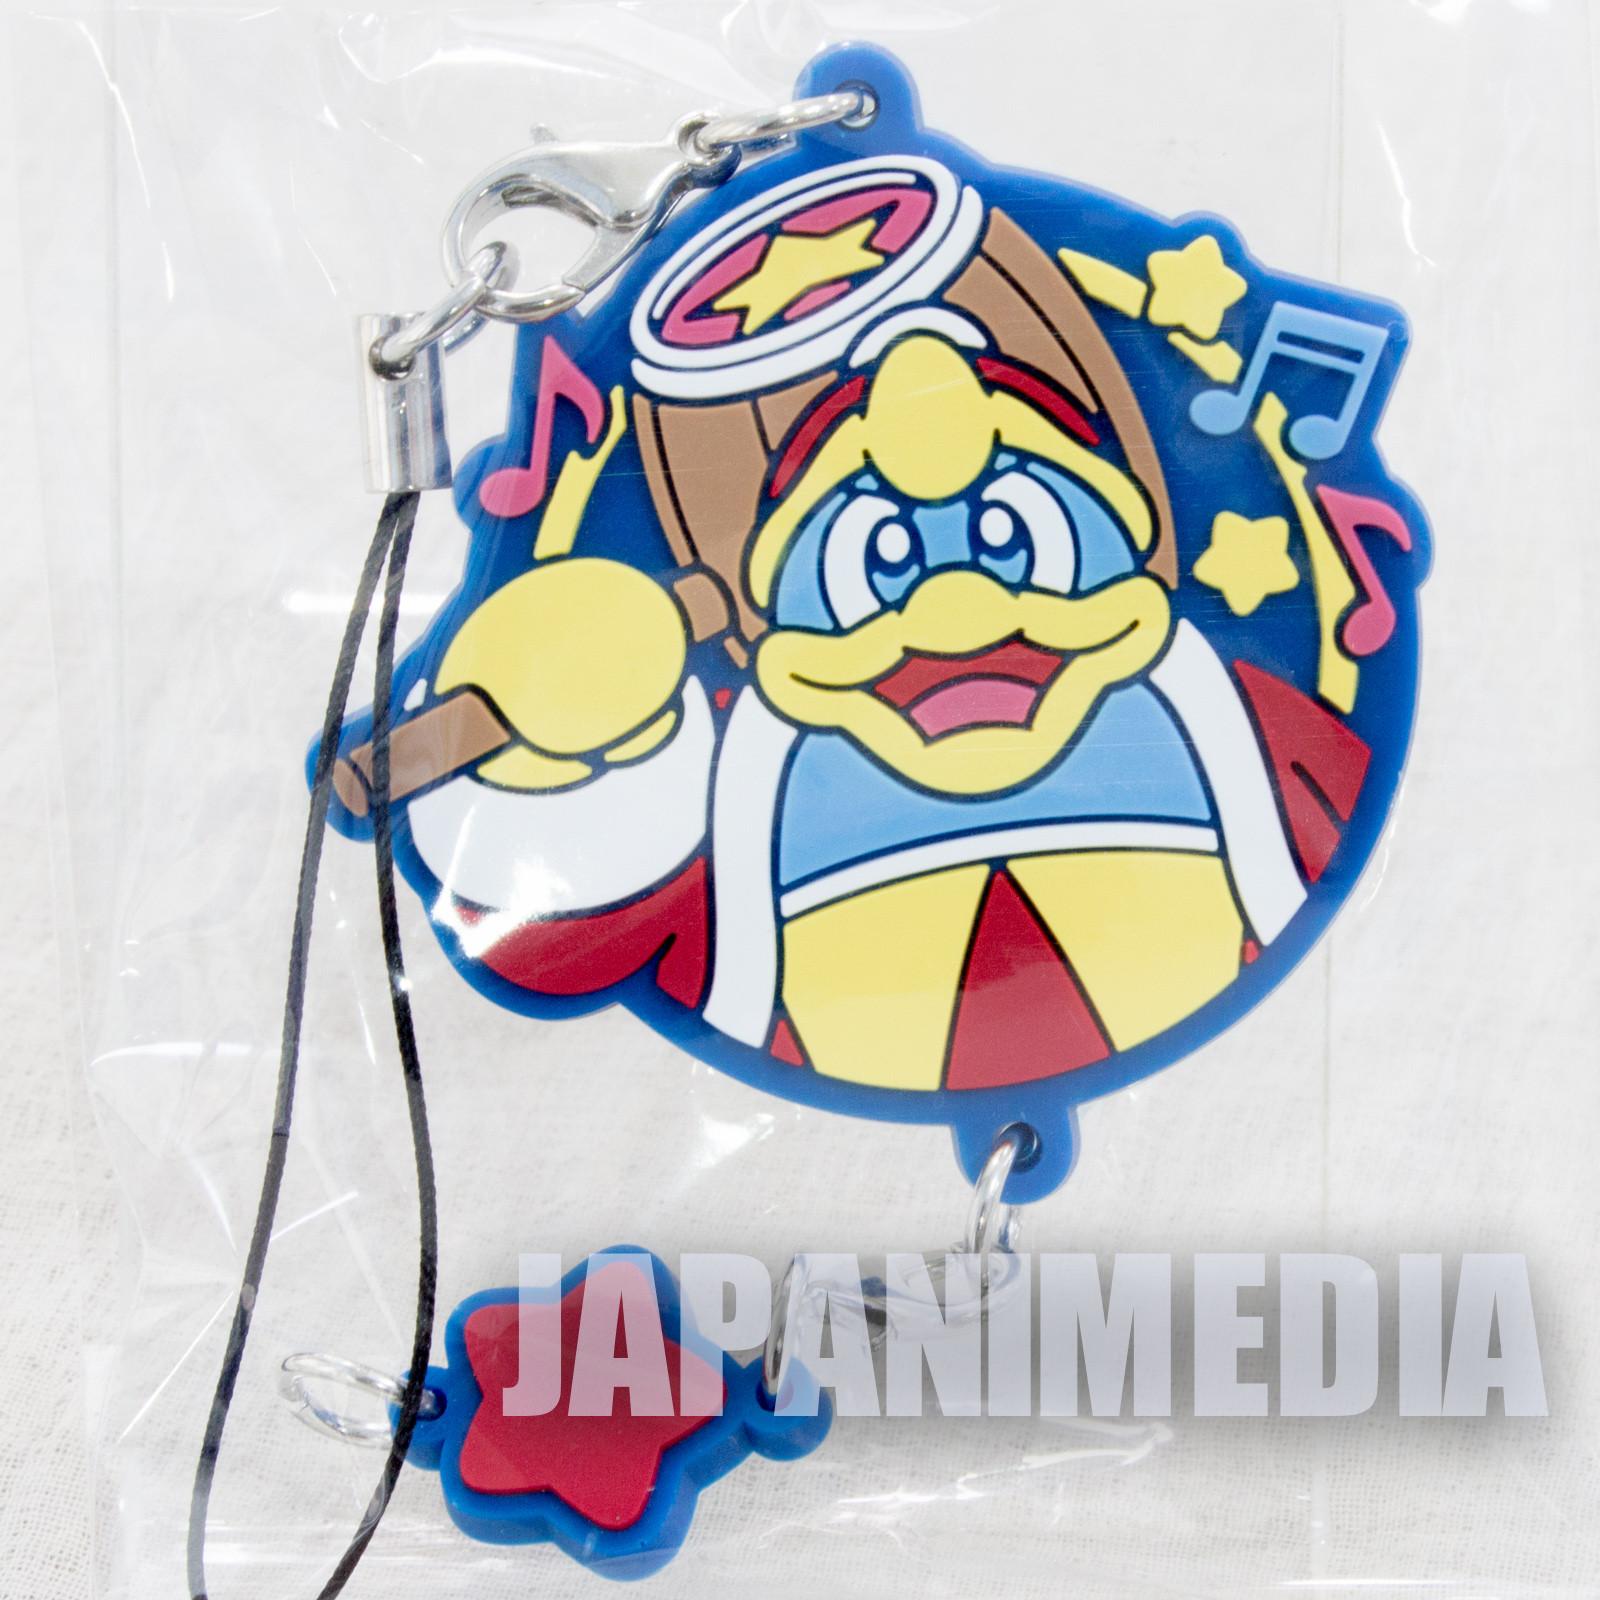 Kirby Super Star Mascot Rubber Strap Dedede King ver. Banpresto JAPAN NINTNEDO